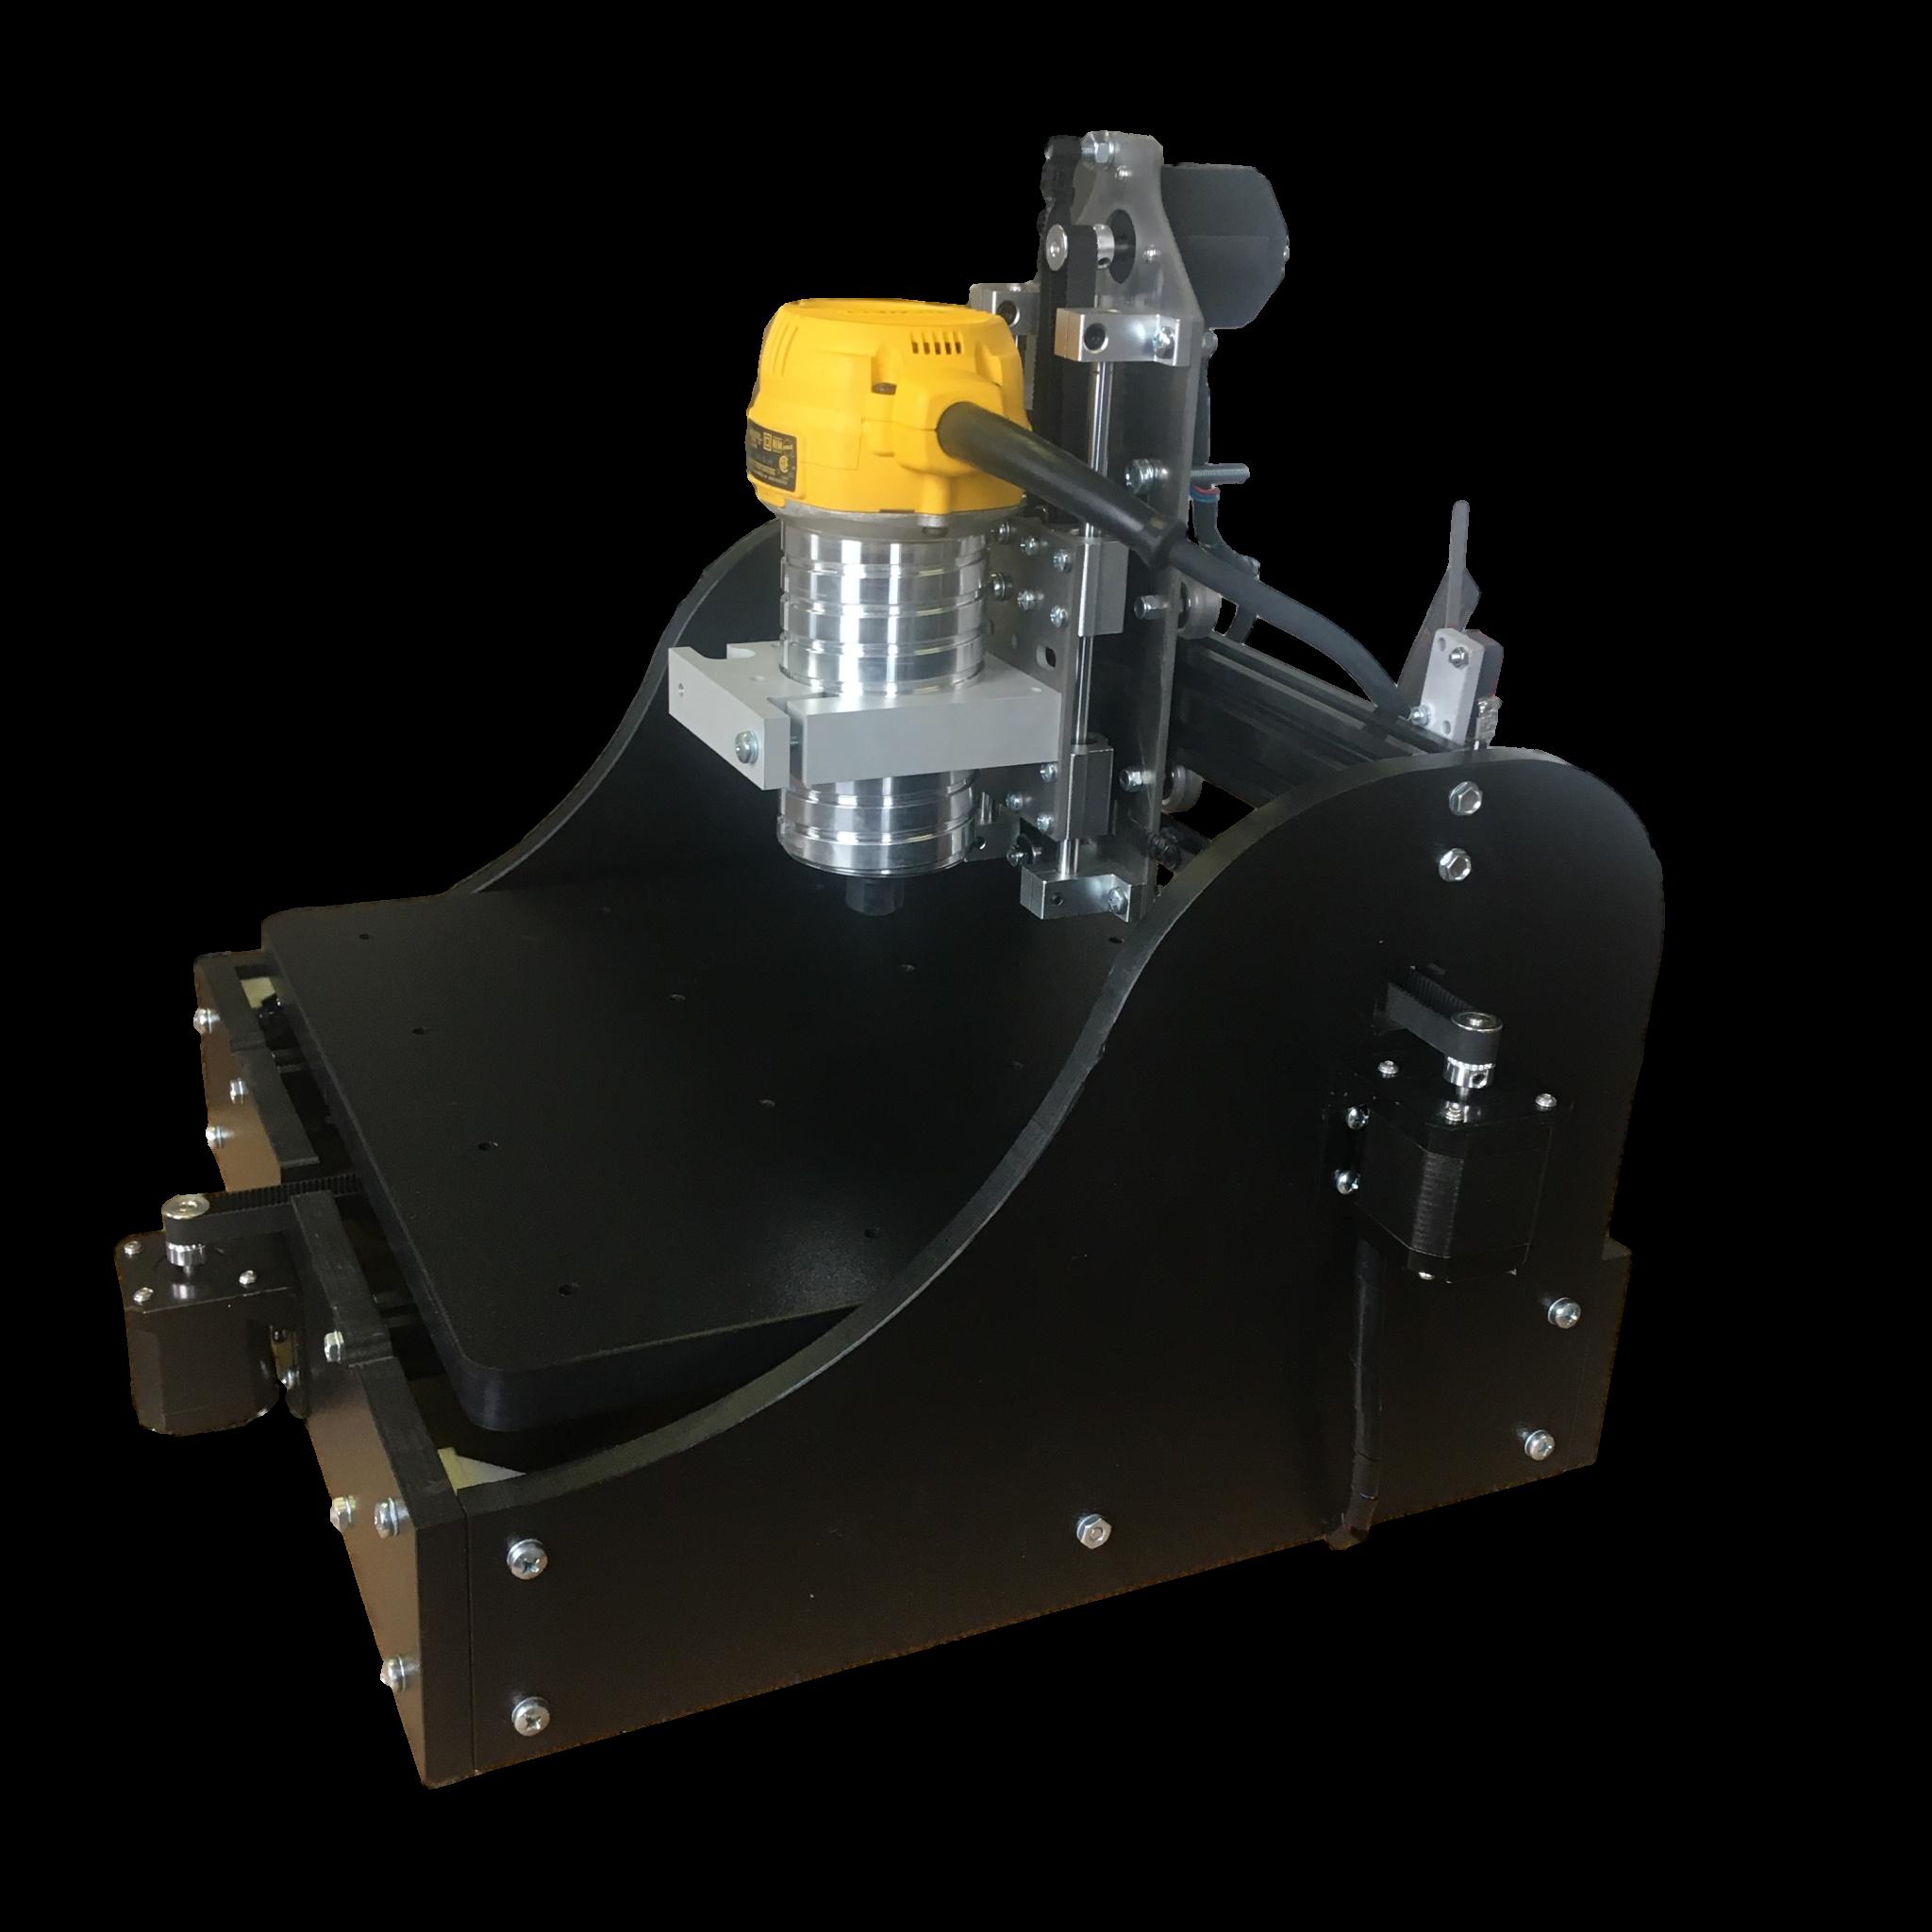 millright cnc m3 kit bundle | mill right cnc | affordable & reliable cnc  machines